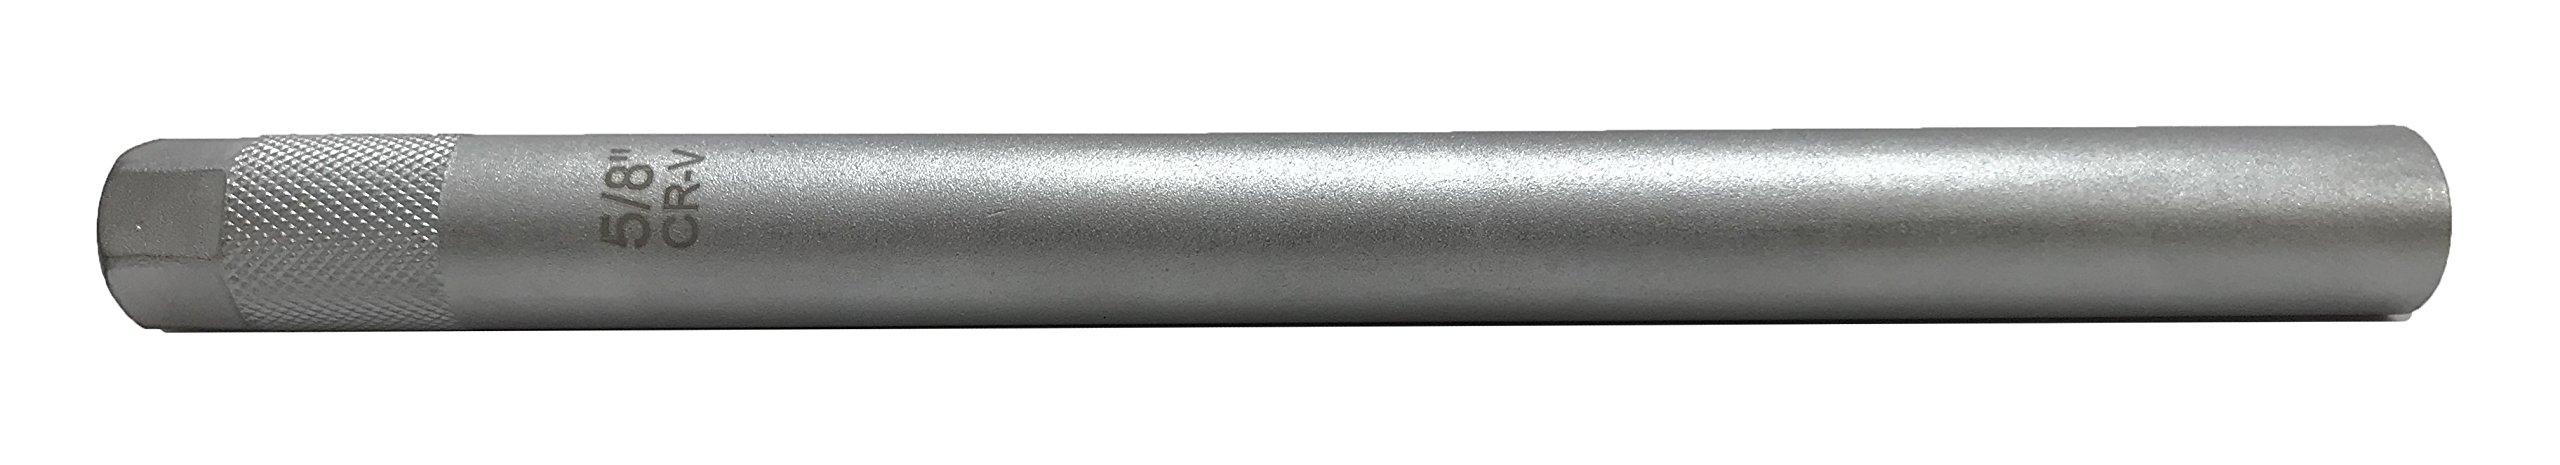 CTA Tools 2380 10'' Long 5/8'' Spark Plug Socket by CTA Tools (Image #1)